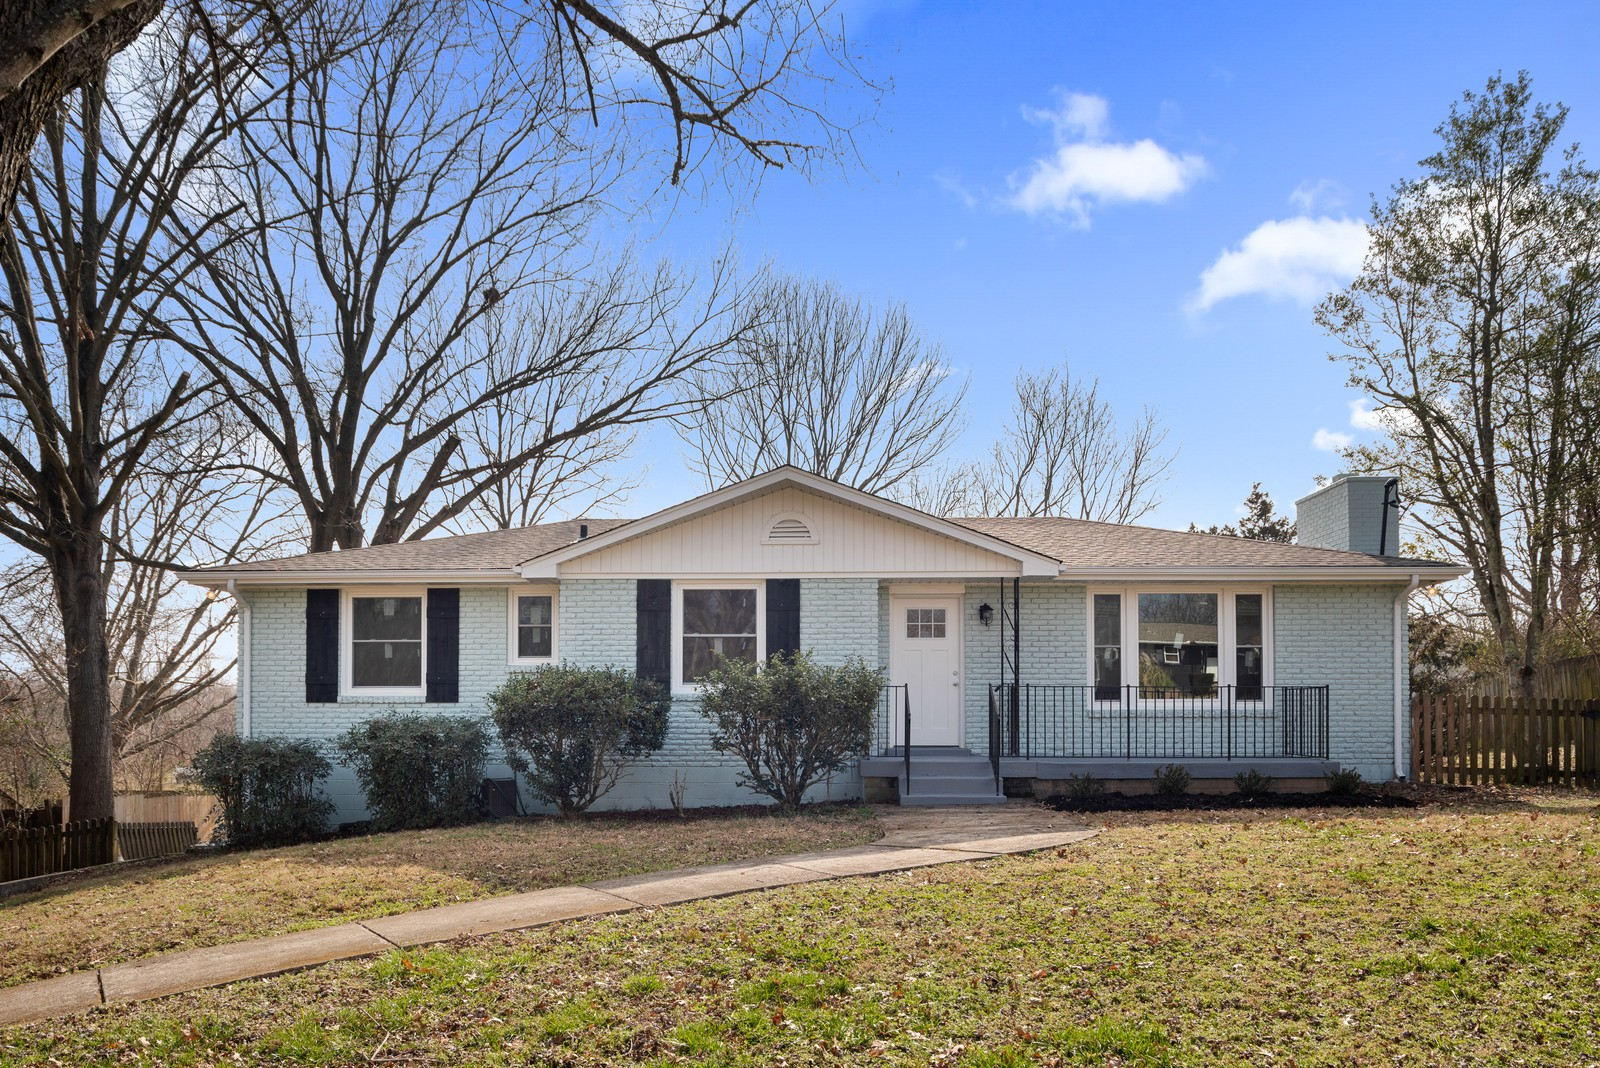 1919 Rosebank Ave, Nashville, TN 37216 - Nashville, TN real estate listing